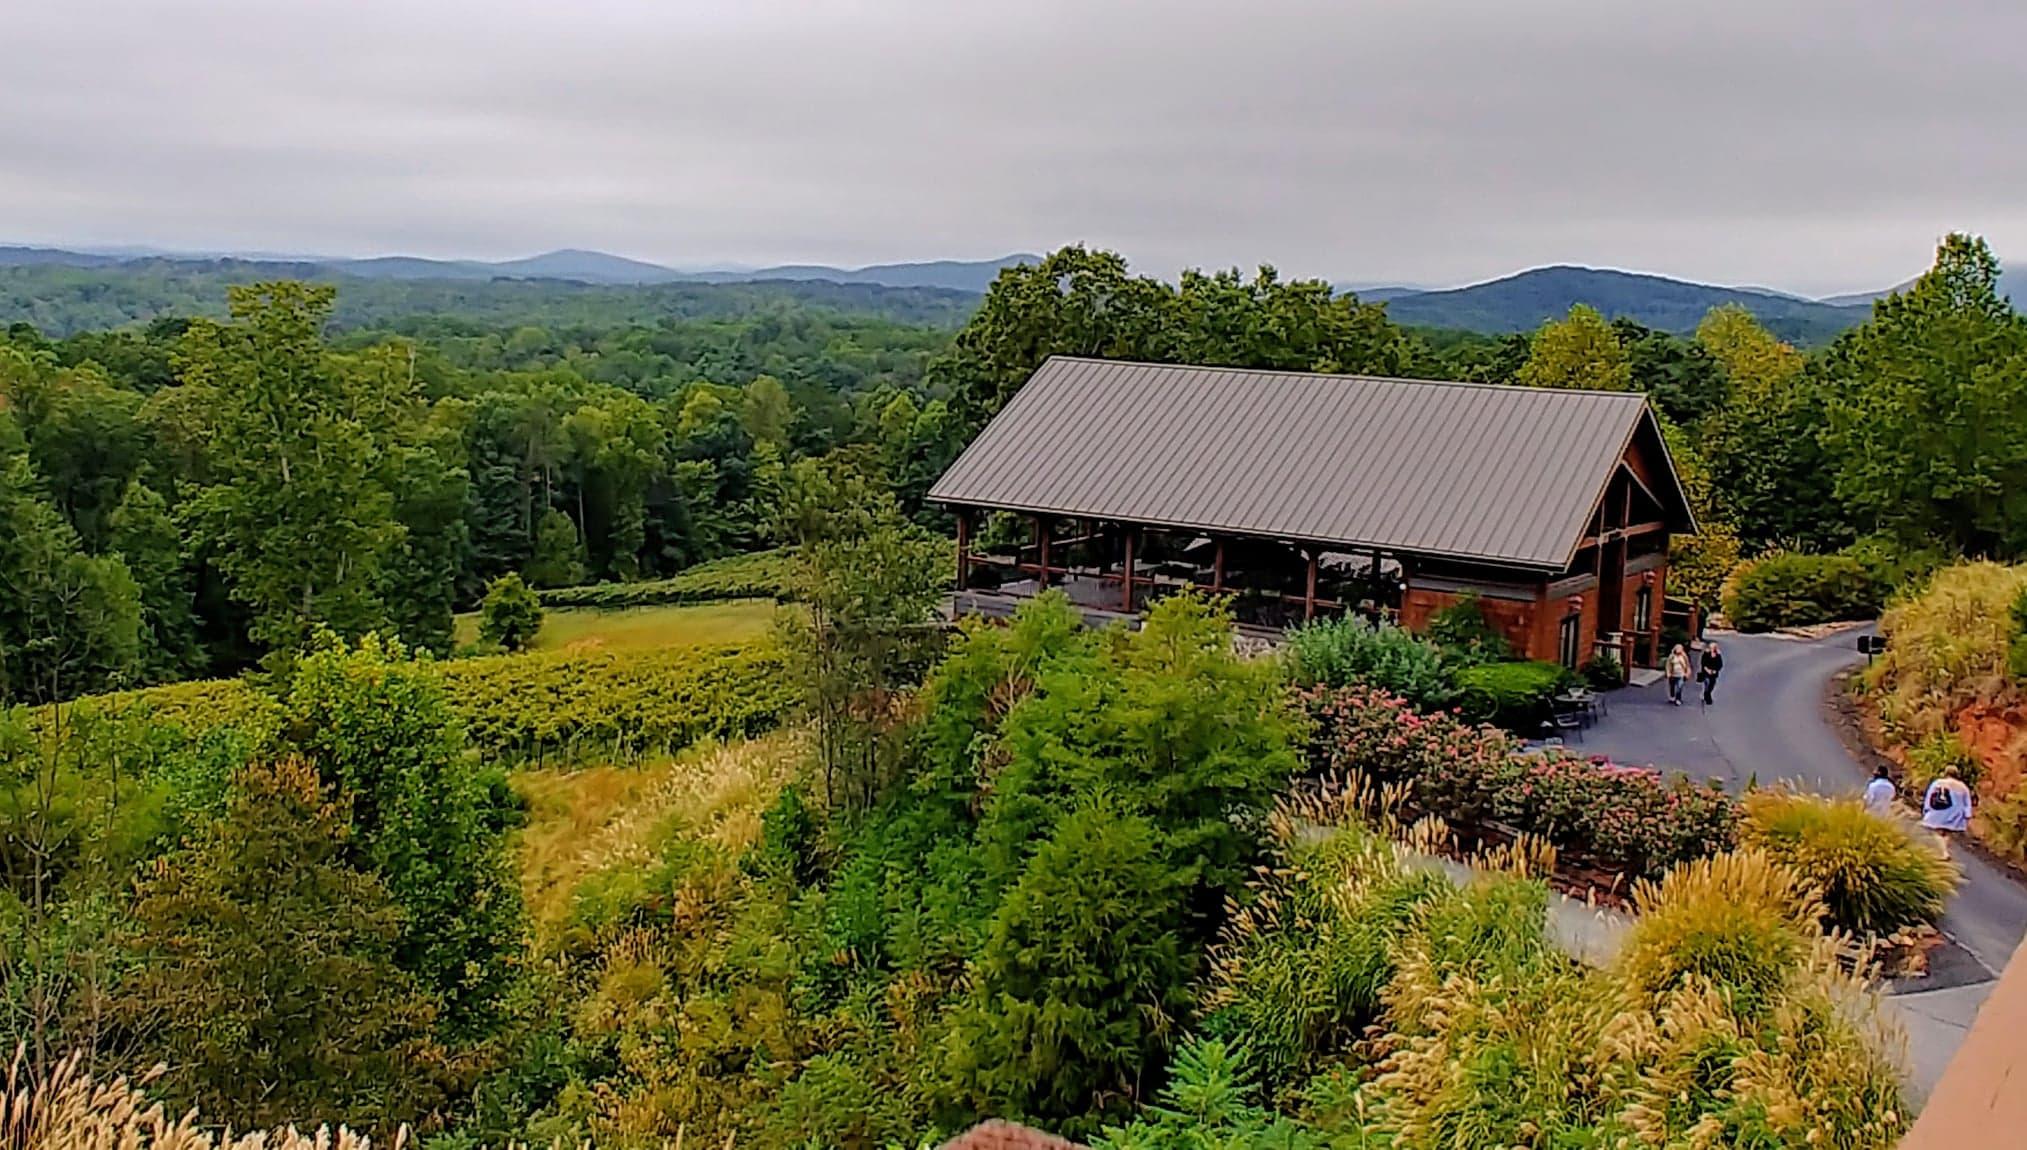 Wolf-Mountain-Outdoor-Wine-Tasting-Vineyard-Mountain-Views-2018-04